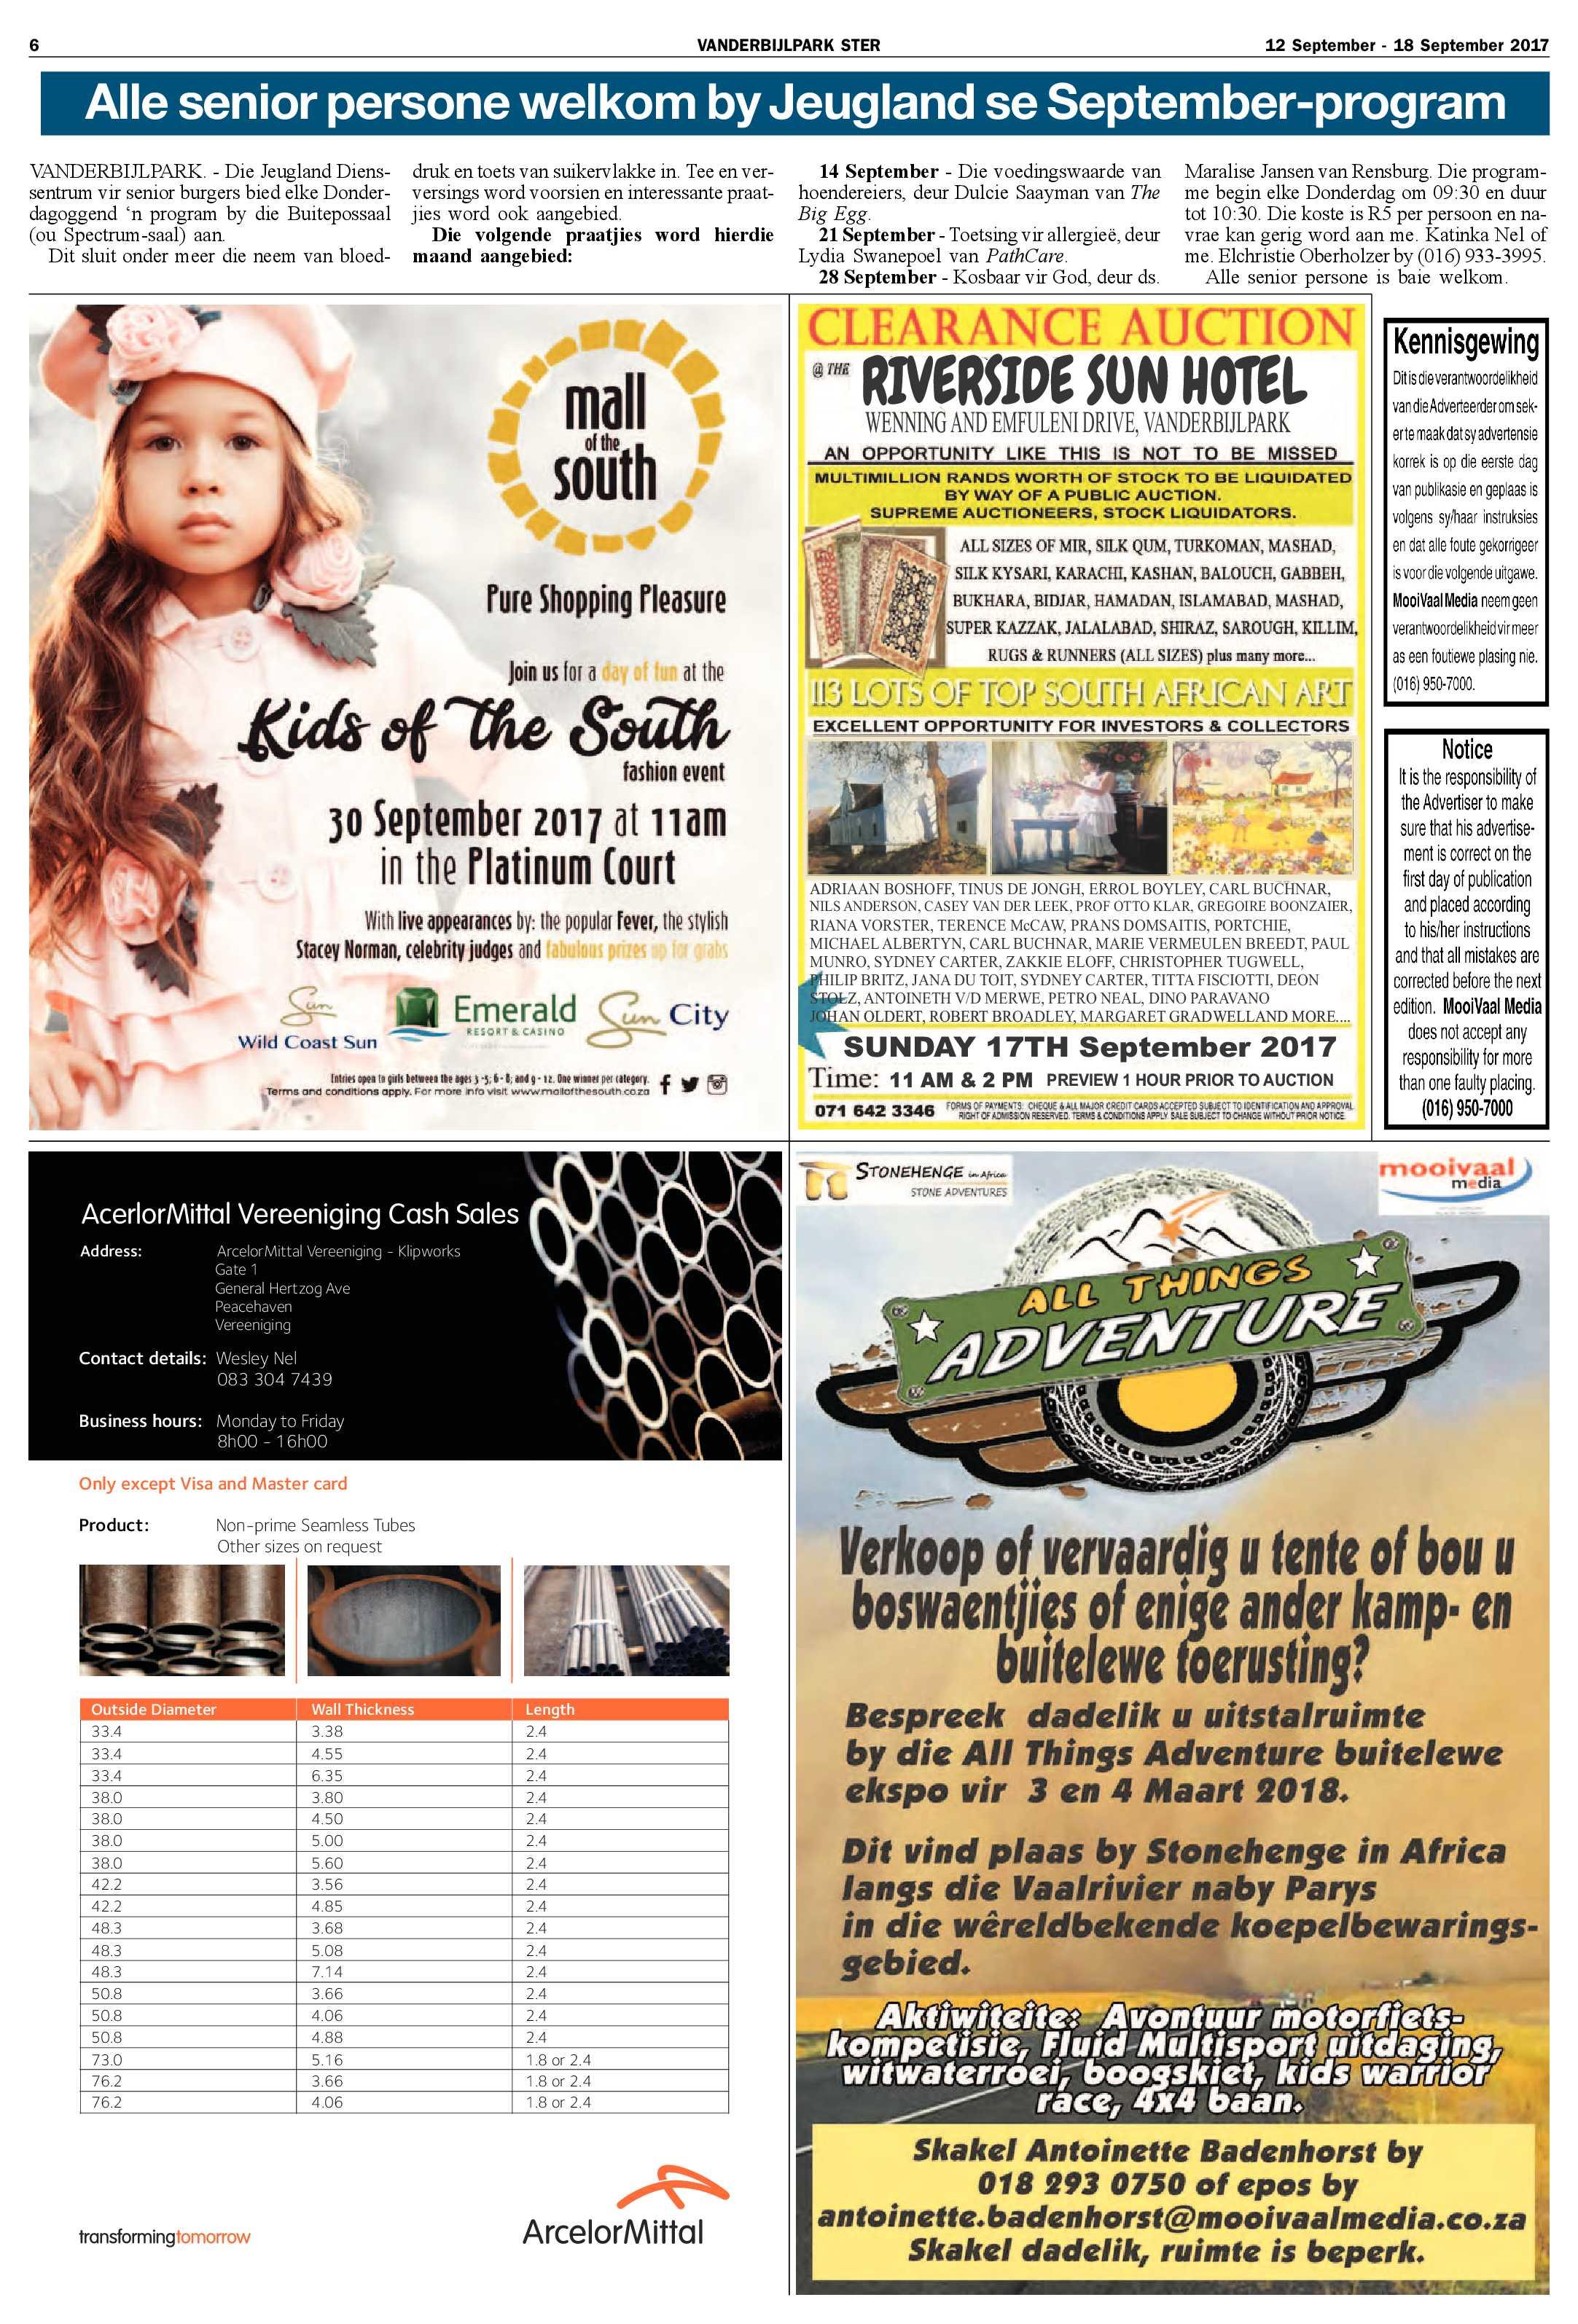 vanderbijlpark-ster-12-18-september-2017-epapers-page-6